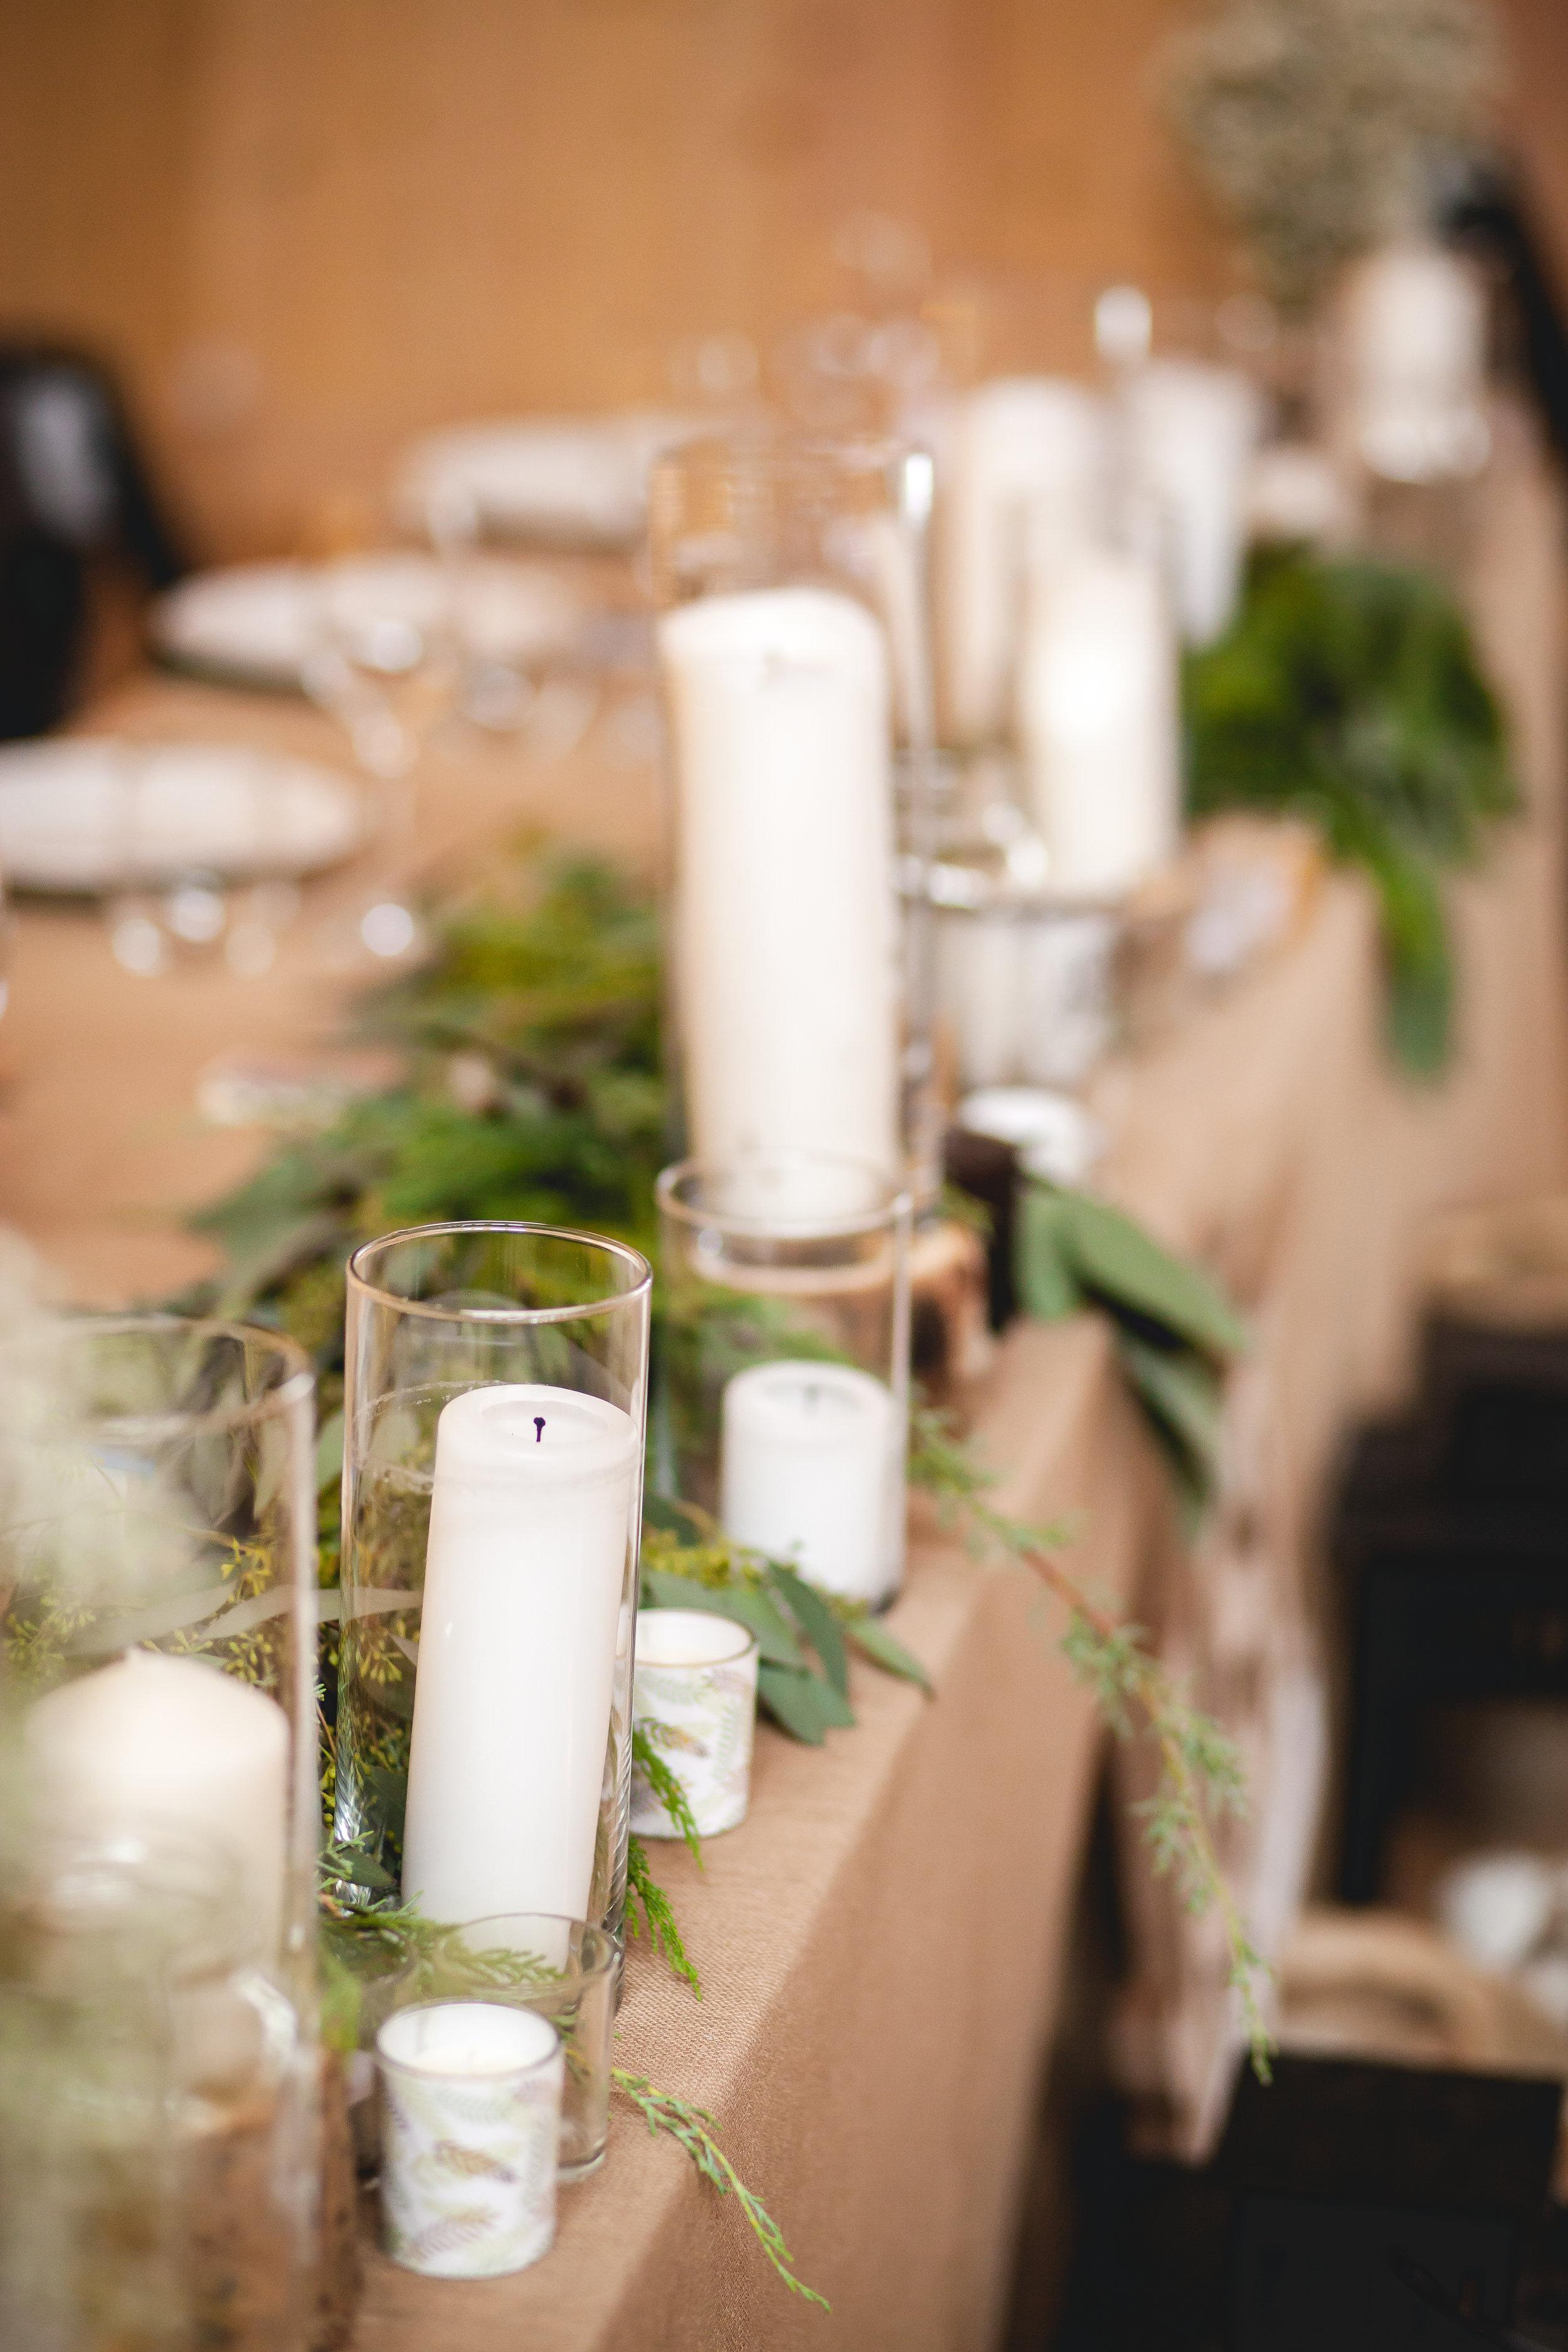 Amy D Photography- Winter Wedding- Tiffin Centre- Vintage Wedding Decor- Rustic Wedding- Wedding Decorations- Barrie Wedding Photography- Wedding Decor Ideas- Barrie Weddings (113 of 129).jpg